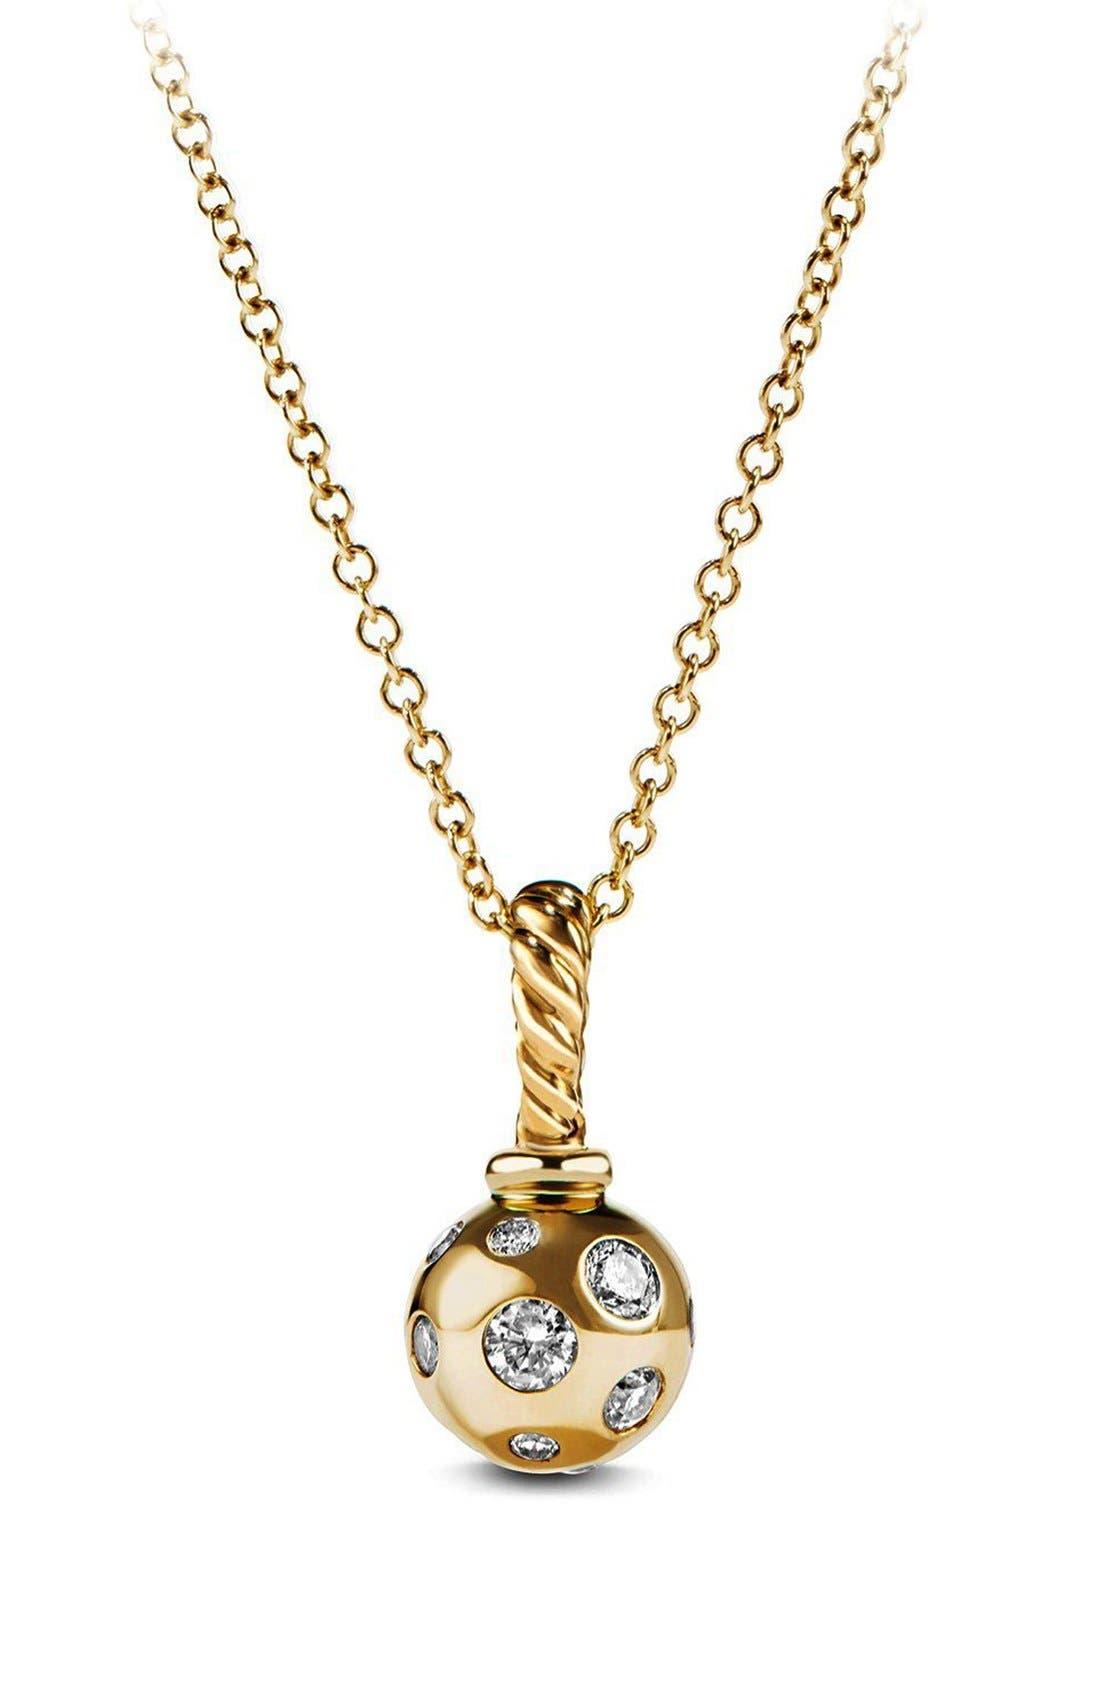 DAVID YURMAN Pendant with Diamonds in 18K Gold